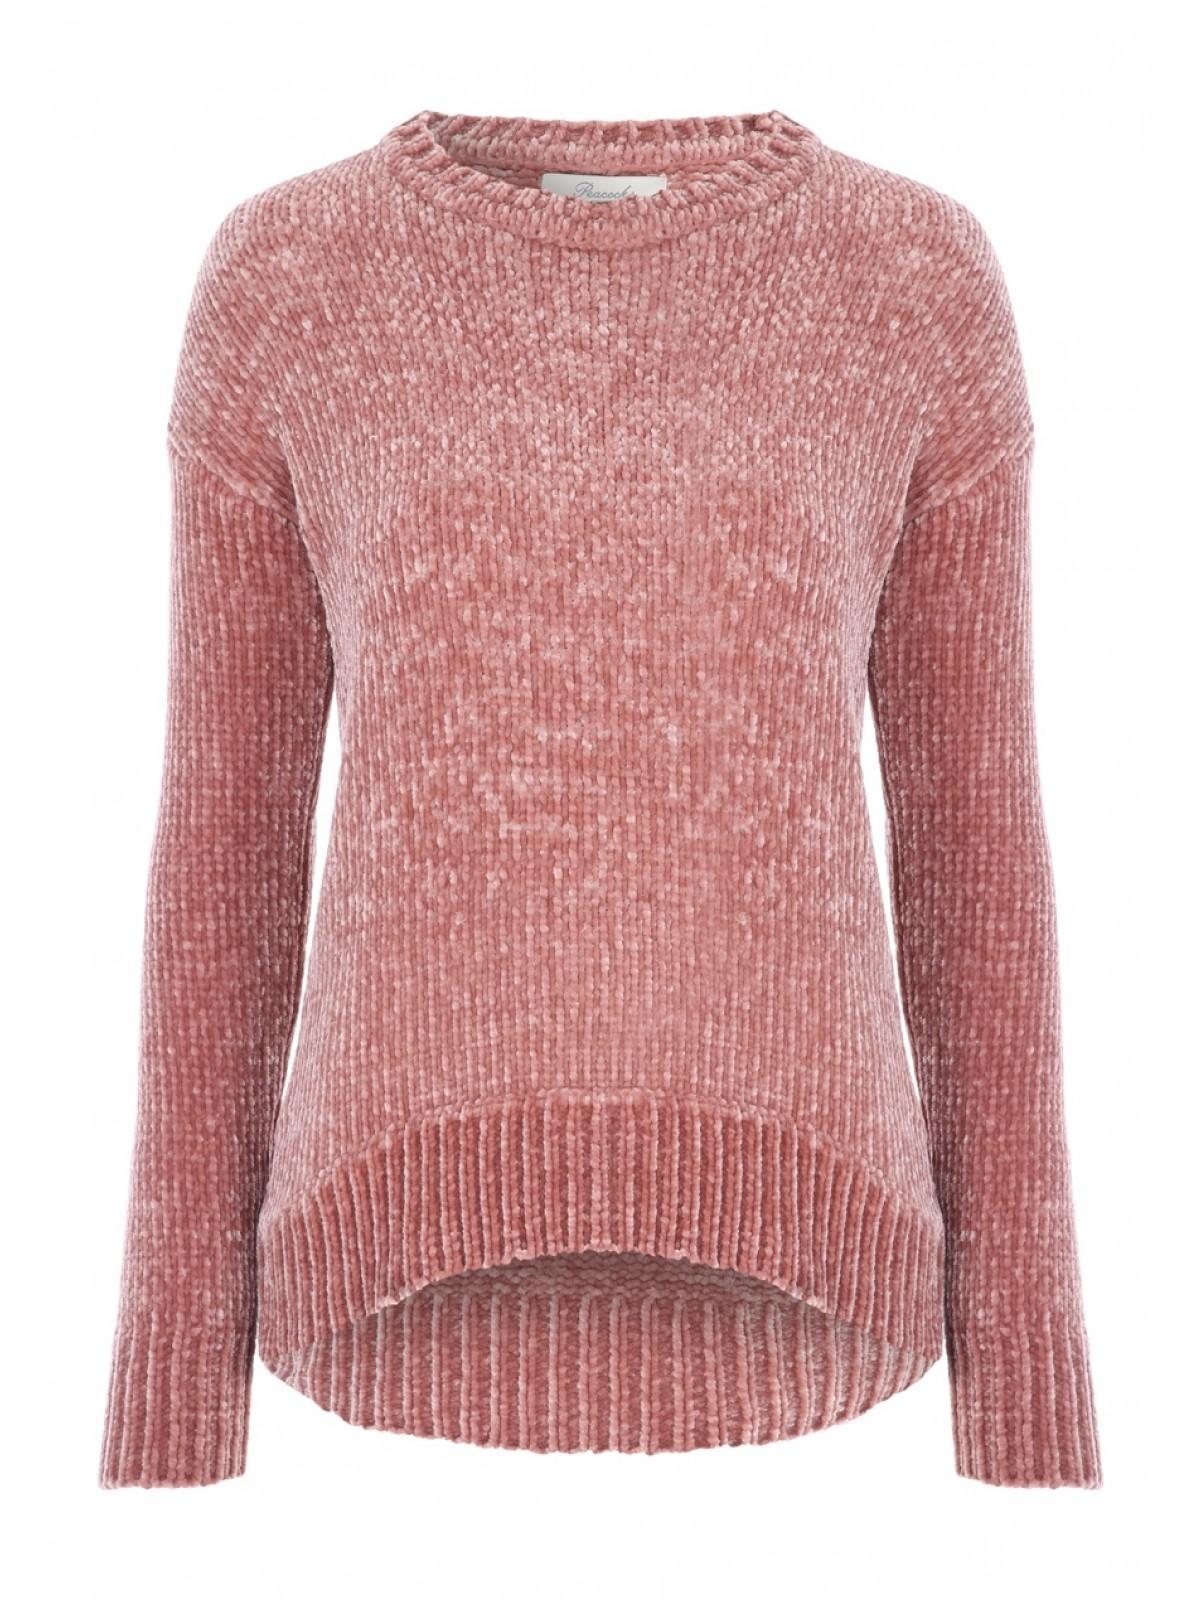 Women's Knitwear - Jumpers, Cardigans & Ponchos | Peacocks | Peacocks